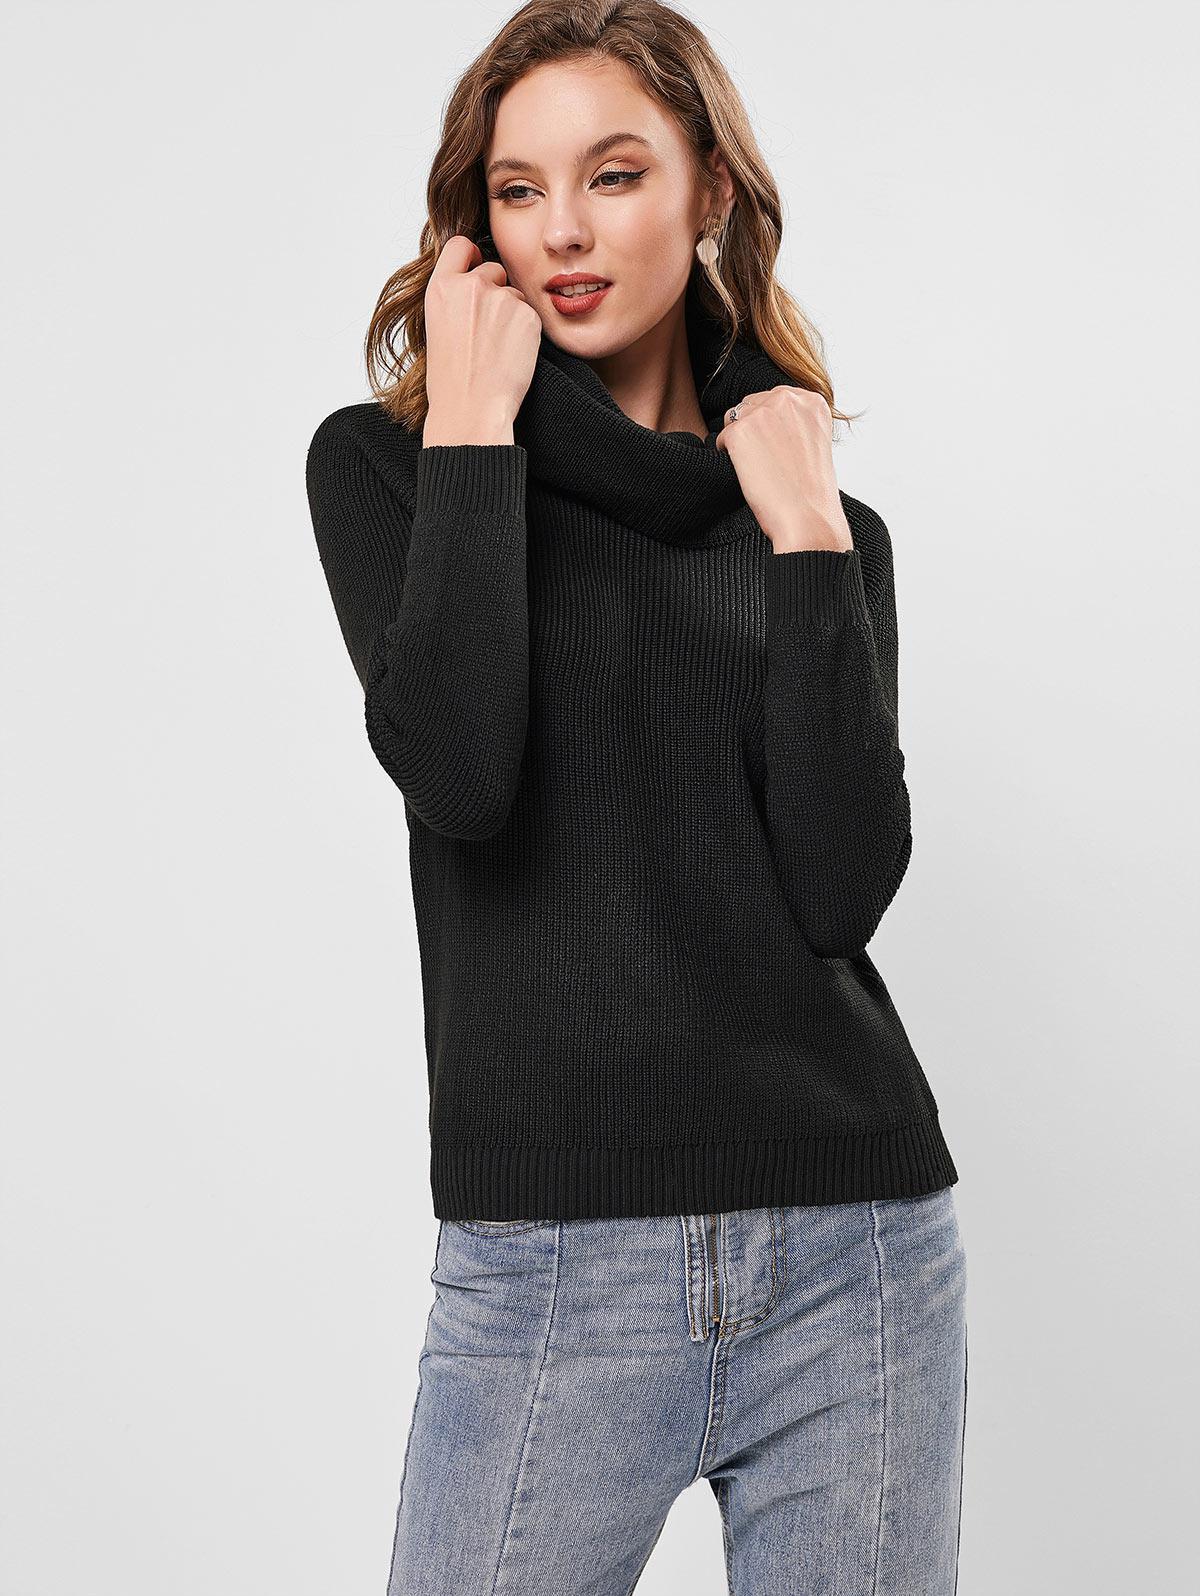 Raglan Sleeve Cowl Neck Knit Sweater